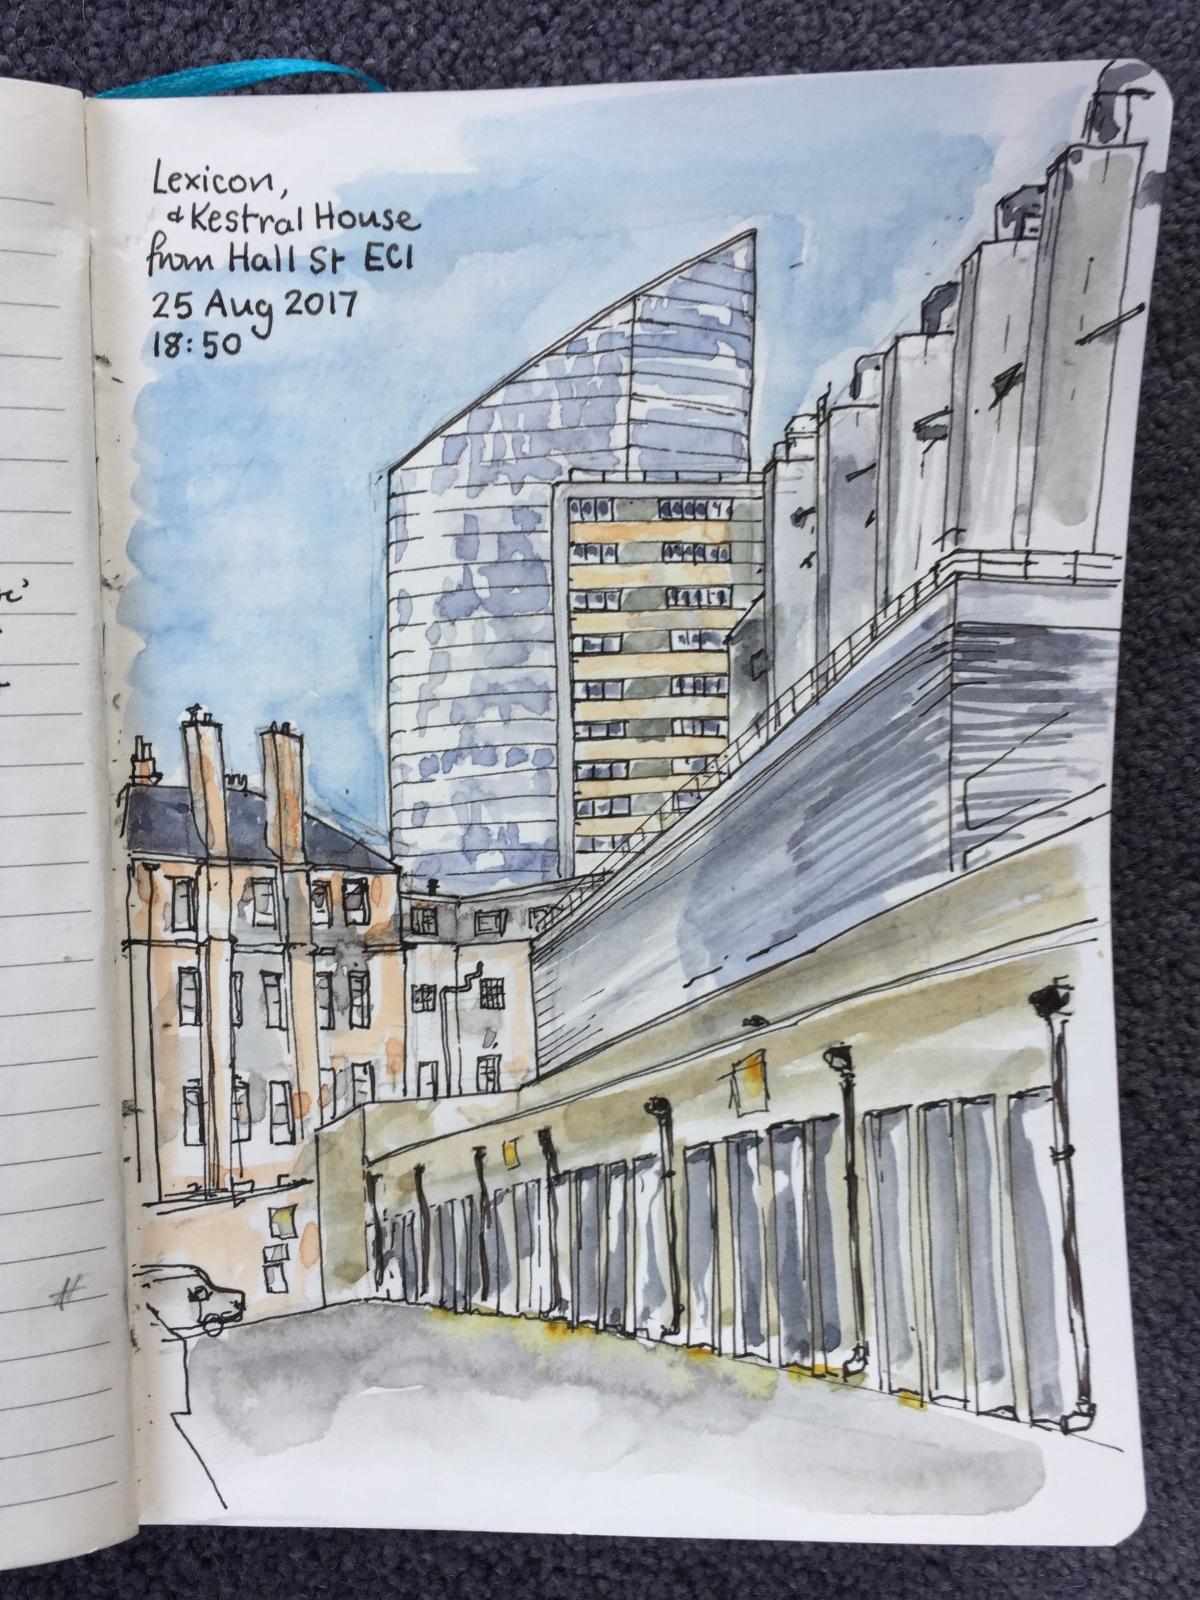 Towers of Finsbury – Rahere andKestrel